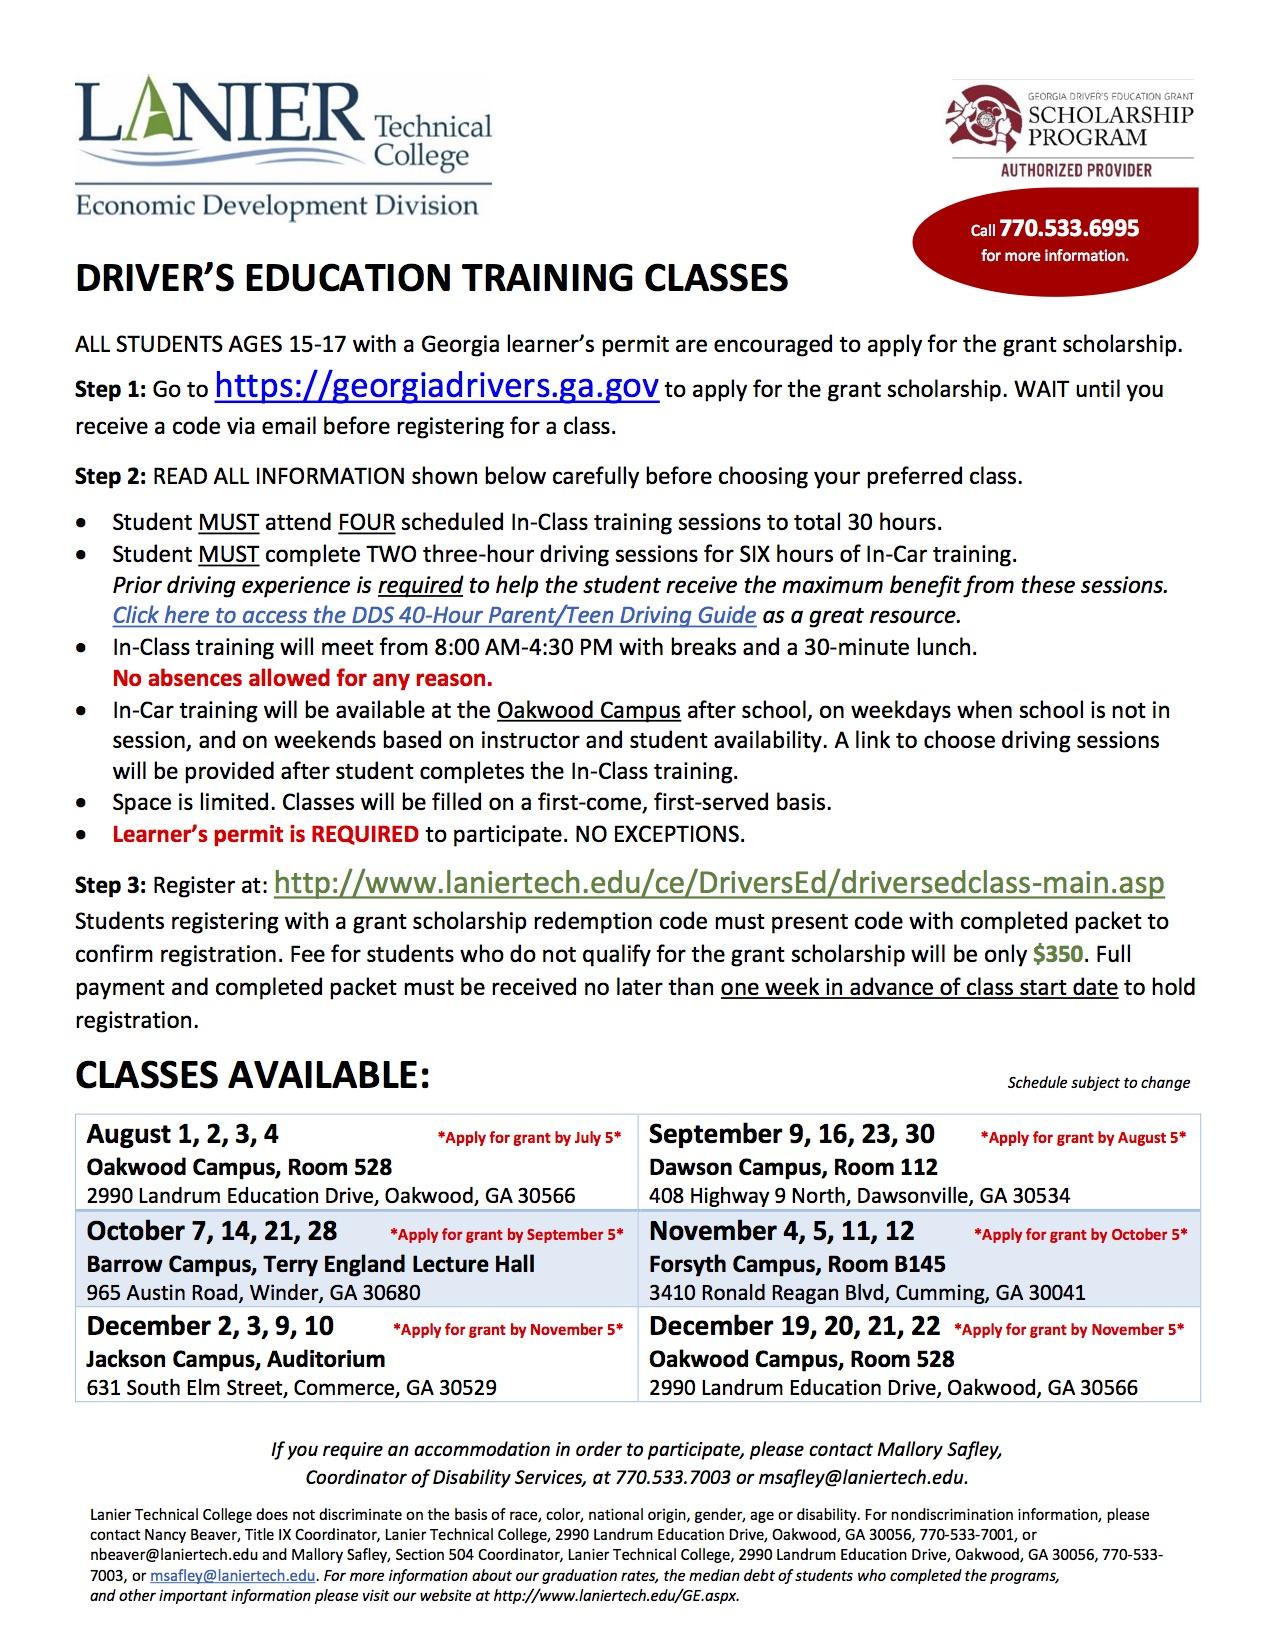 Application Period Georgia Driver's Ed Classes